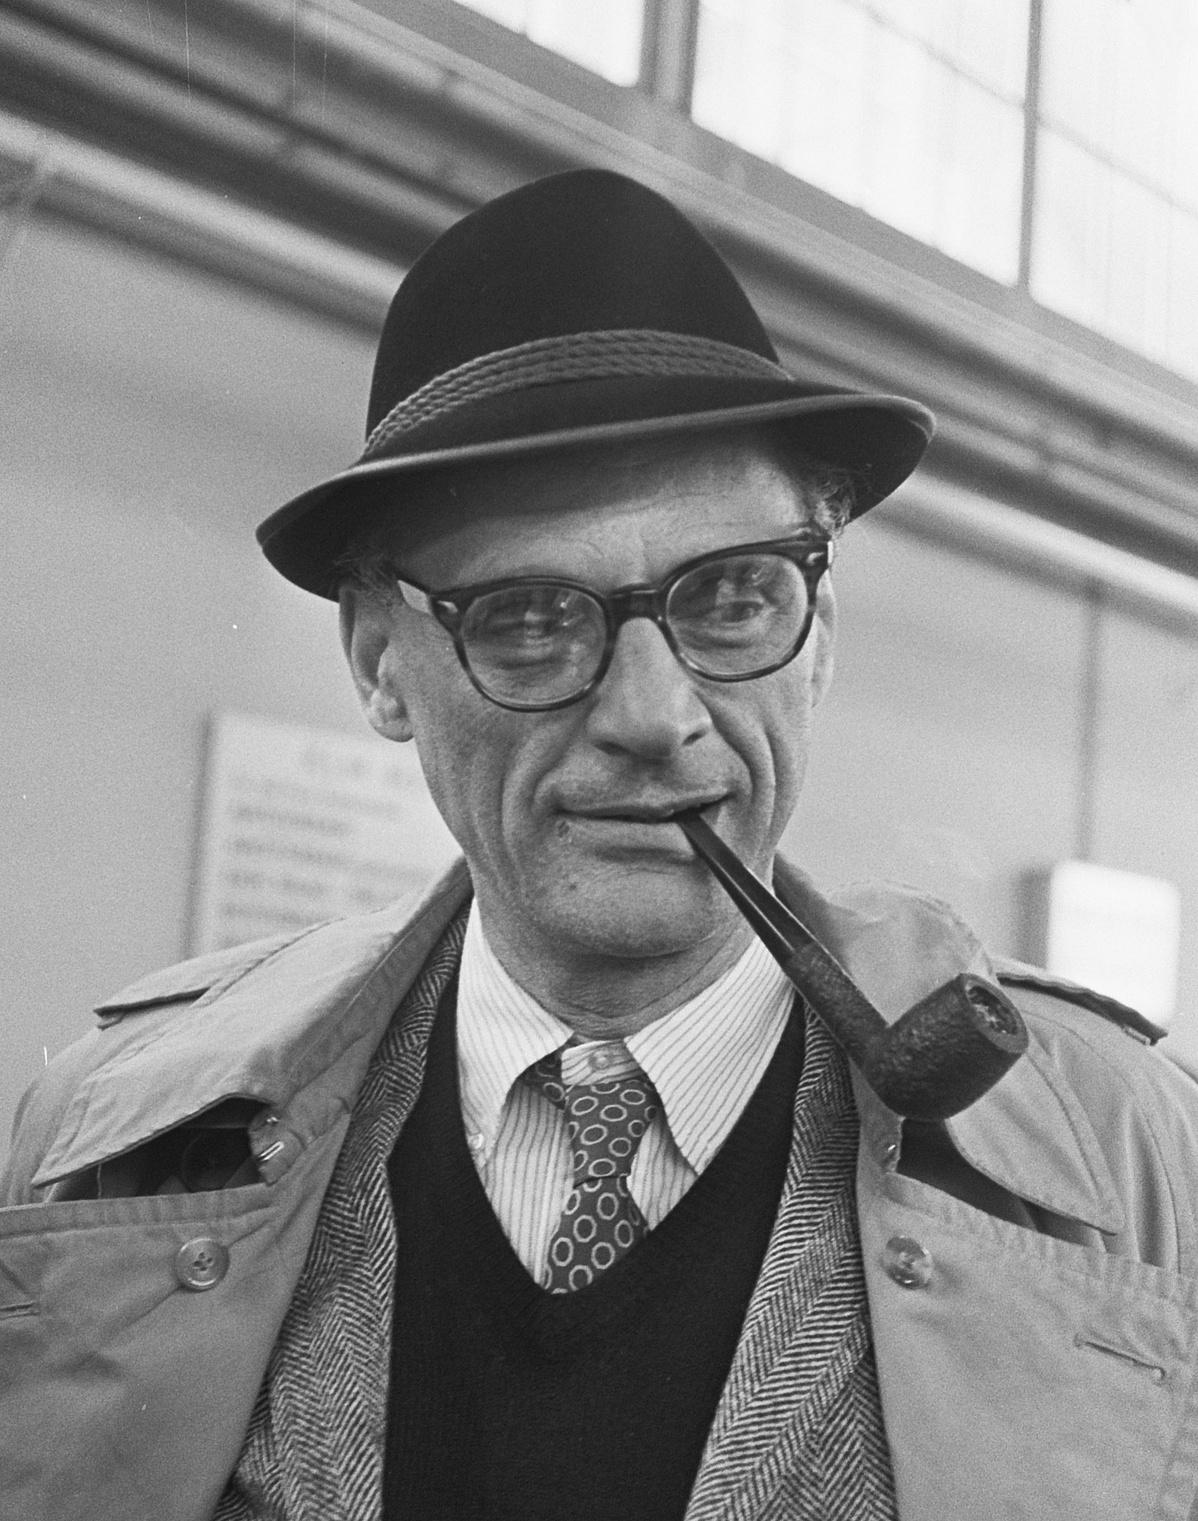 Arthur Miller 1966-ban